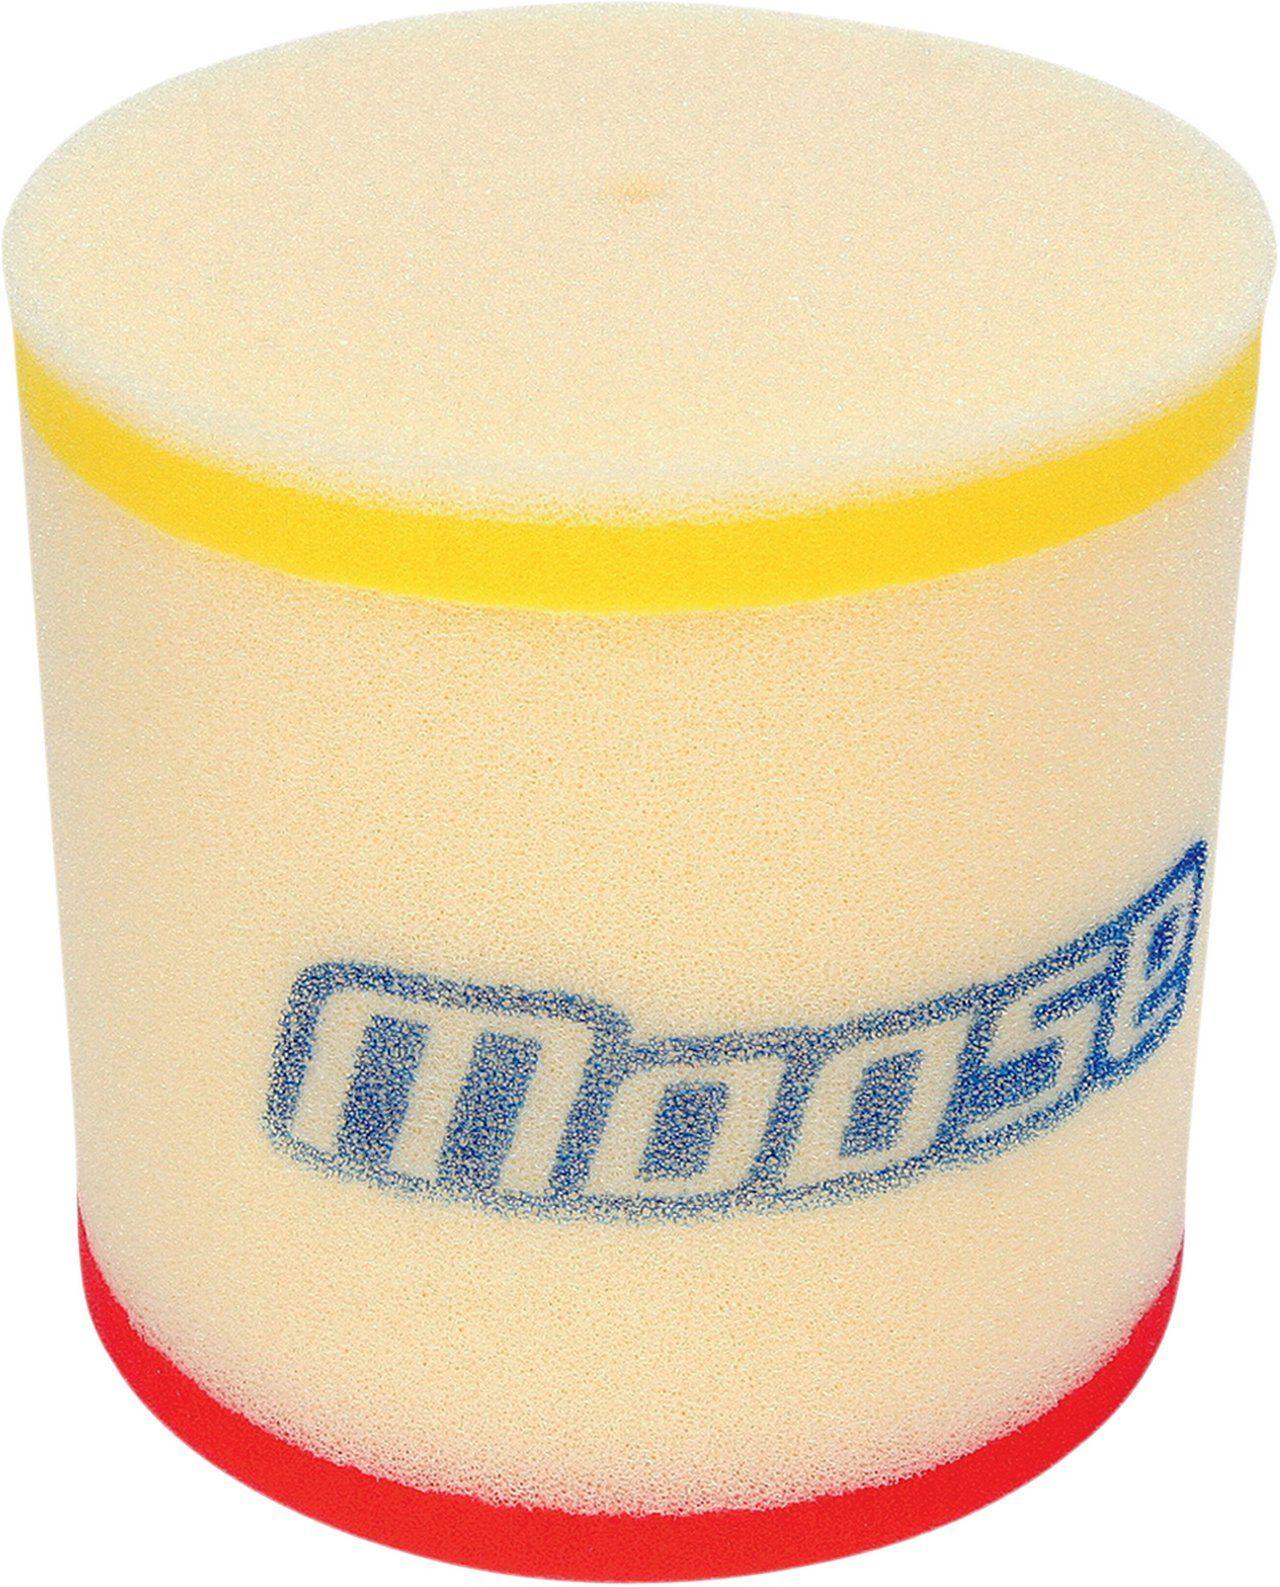 【MOOSE RACING】PPO (PRECISION PRE-OILED) 空氣濾芯 [M763-20-23] - 「Webike-摩托百貨」